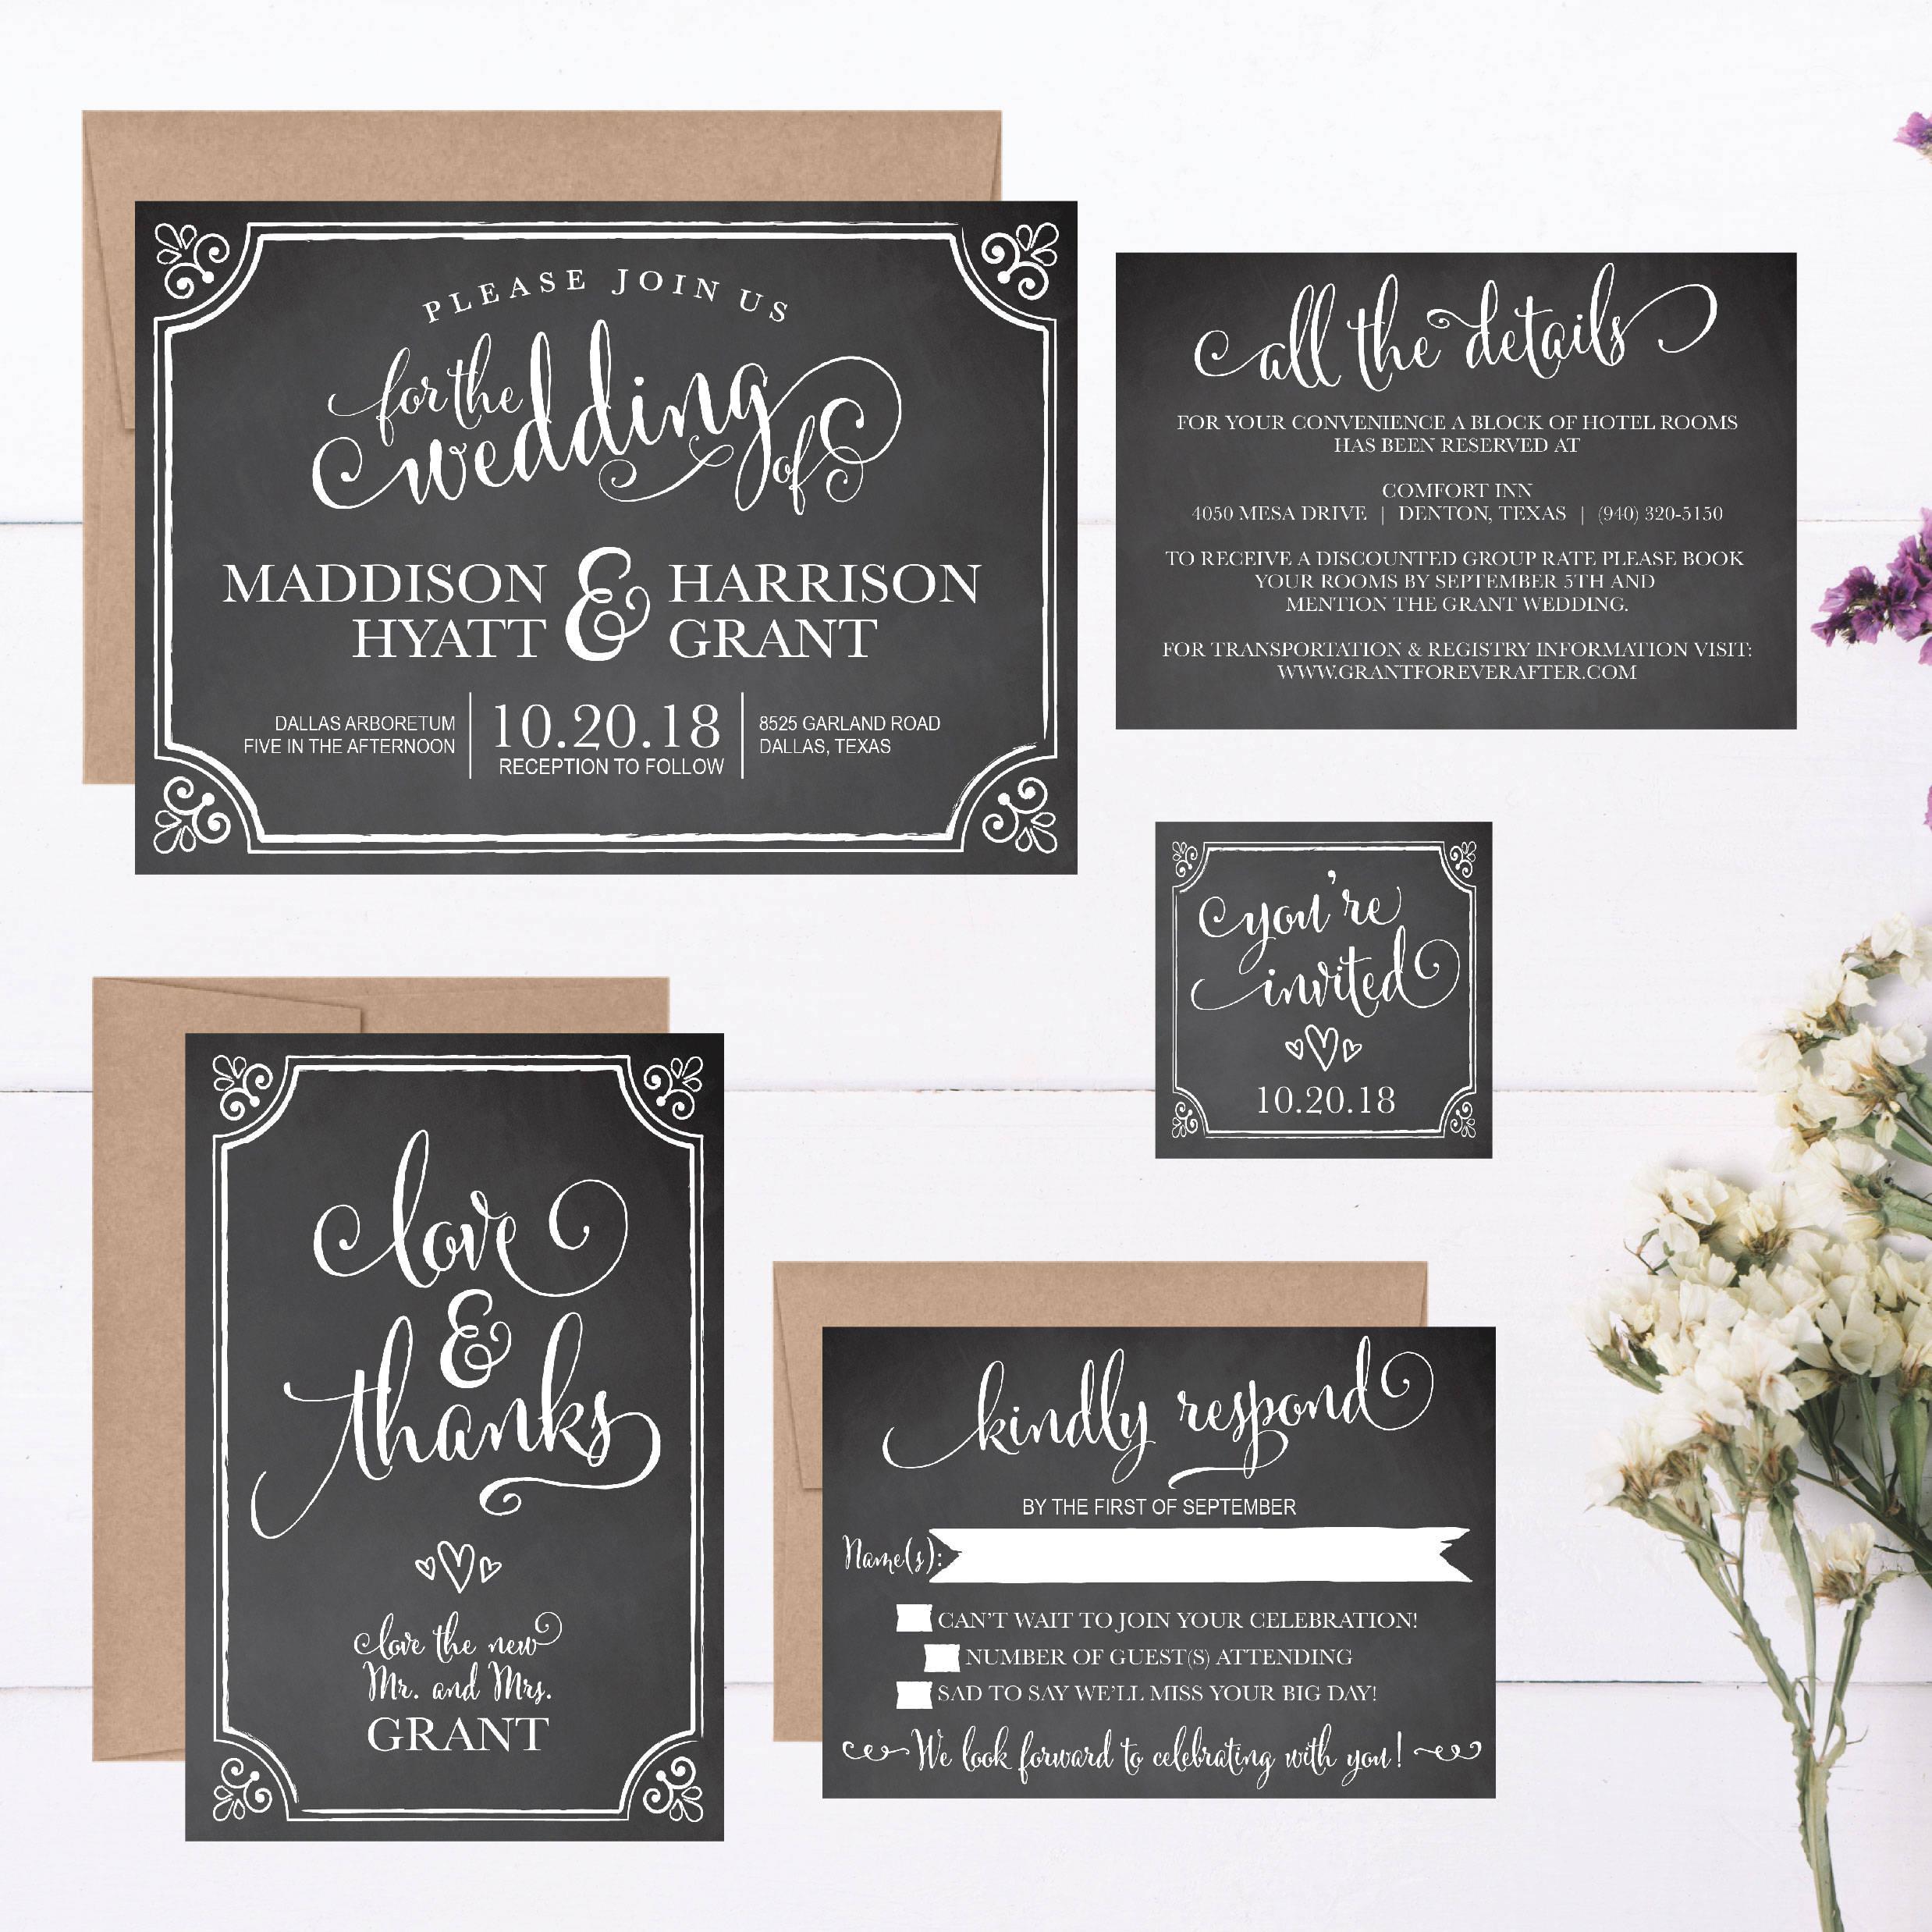 Chalkboard Wedding Invitation Template: Rustic Chalkboard Wedding Invitation Template Vintage Gray